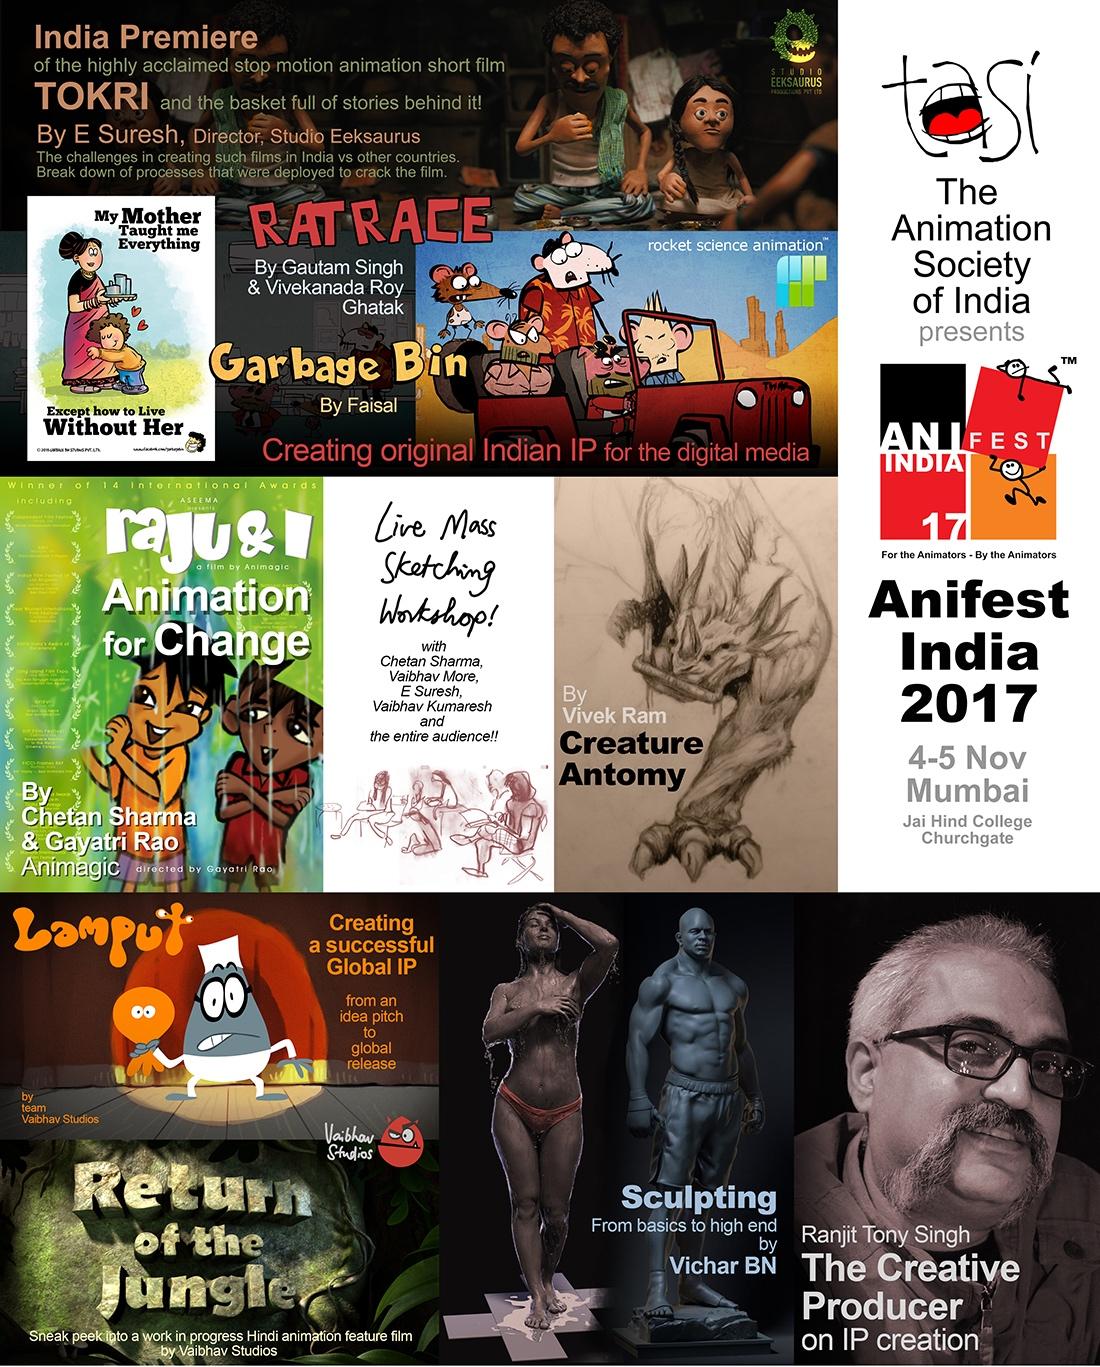 Anifest India 2017 - Register Now!